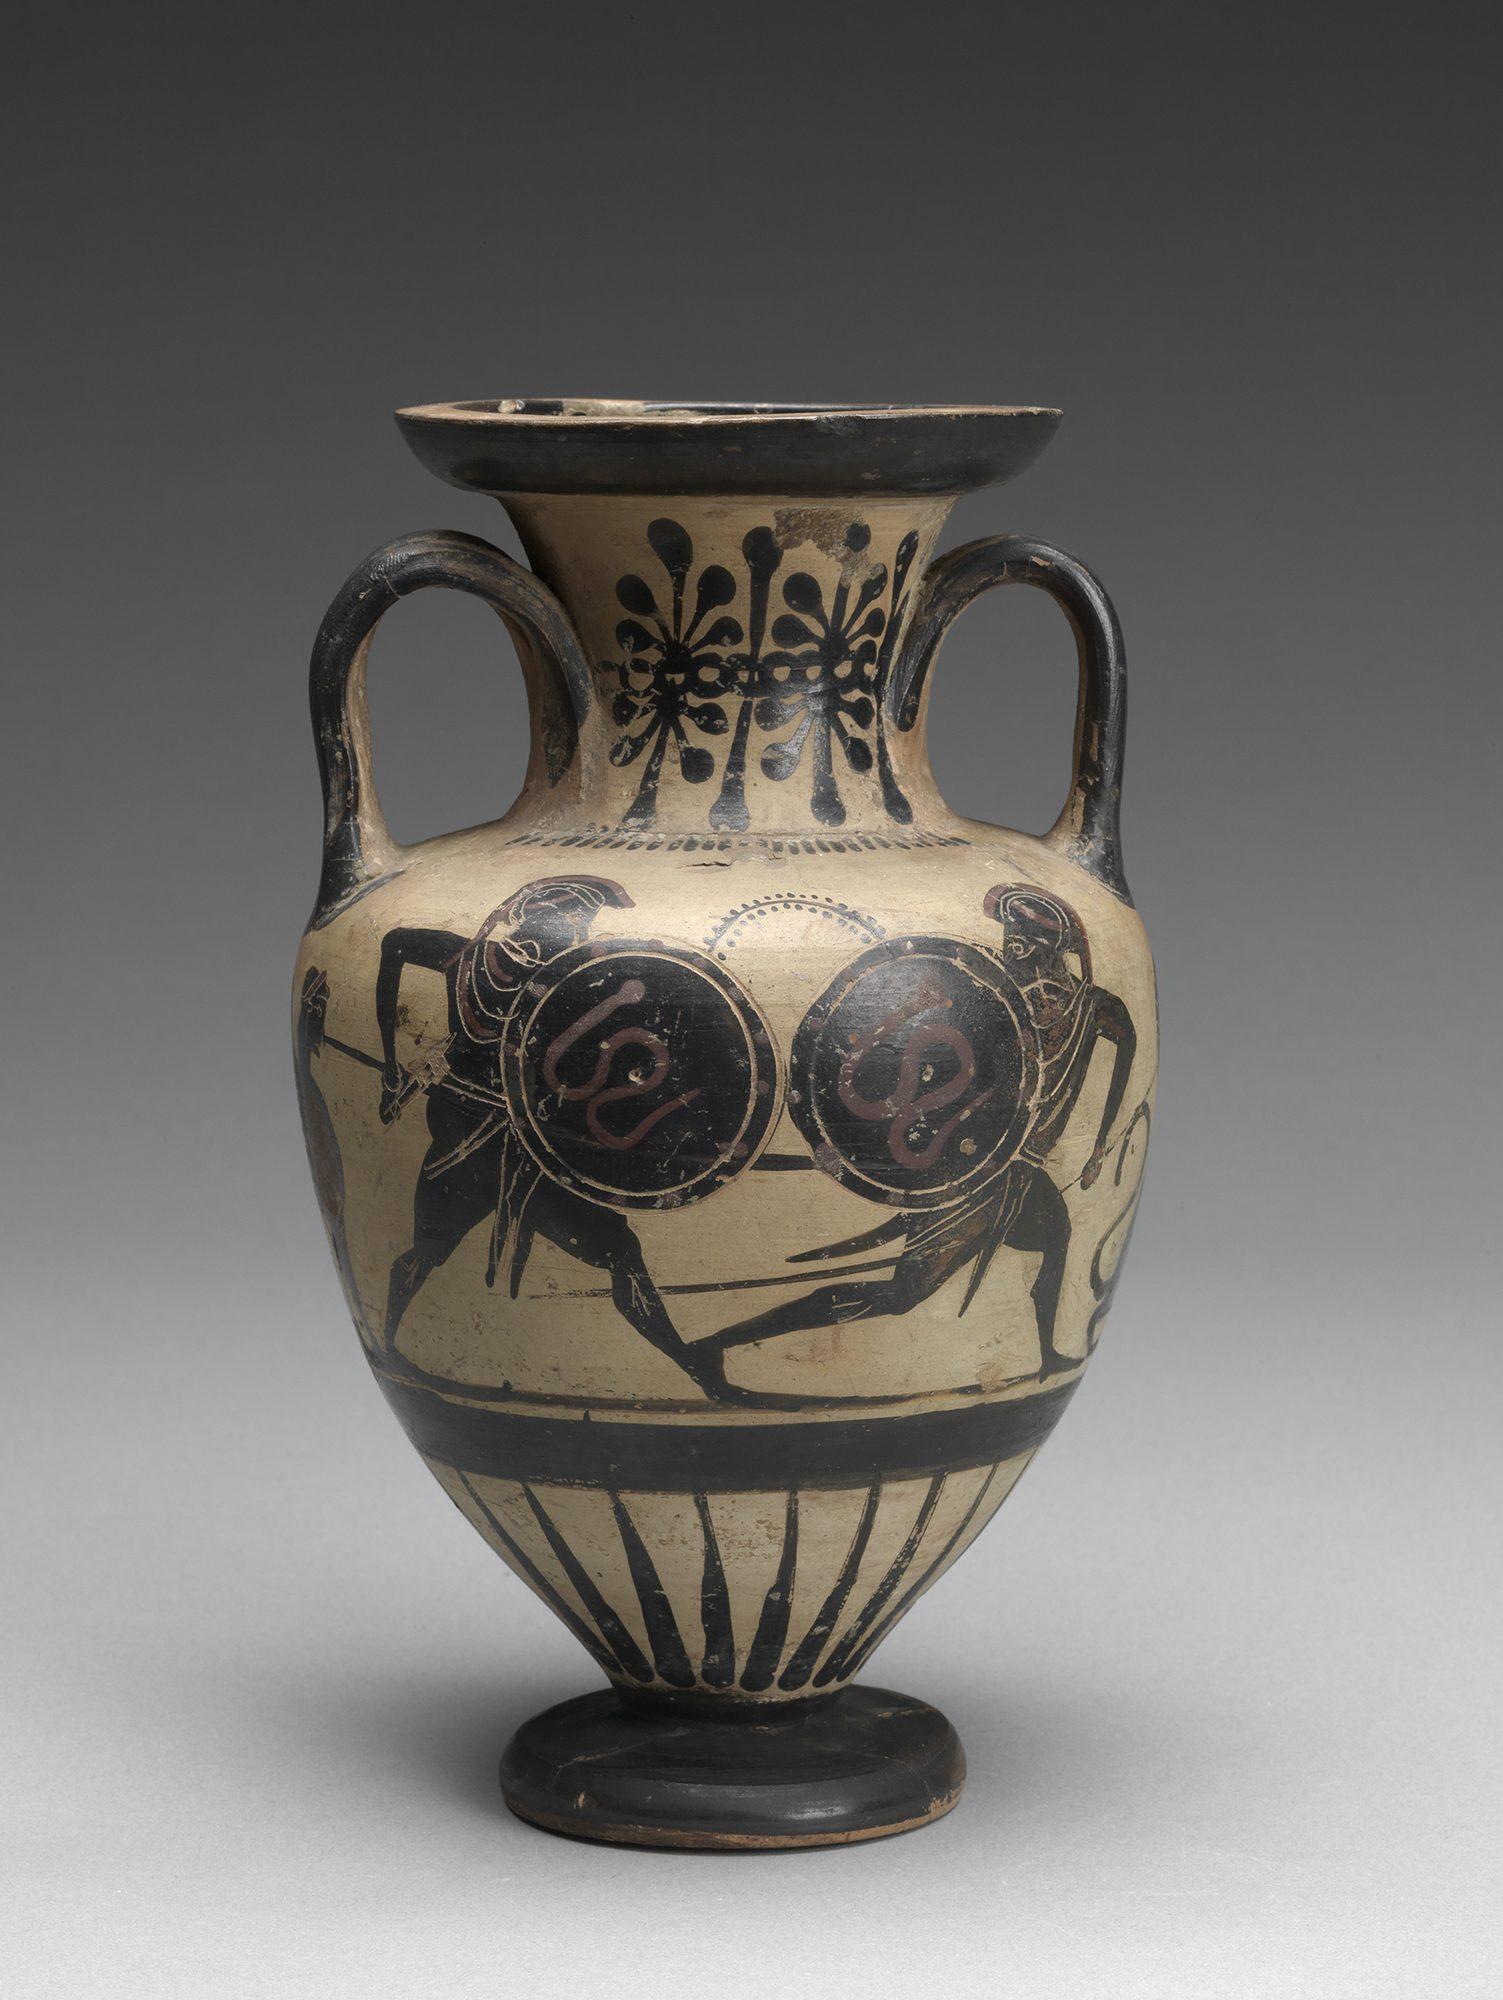 Greek, Black Figure Amphora. Terracotta, 600-500 BC. Gift of Mrs. John W. Field in memory of her husband, 1887.1.40